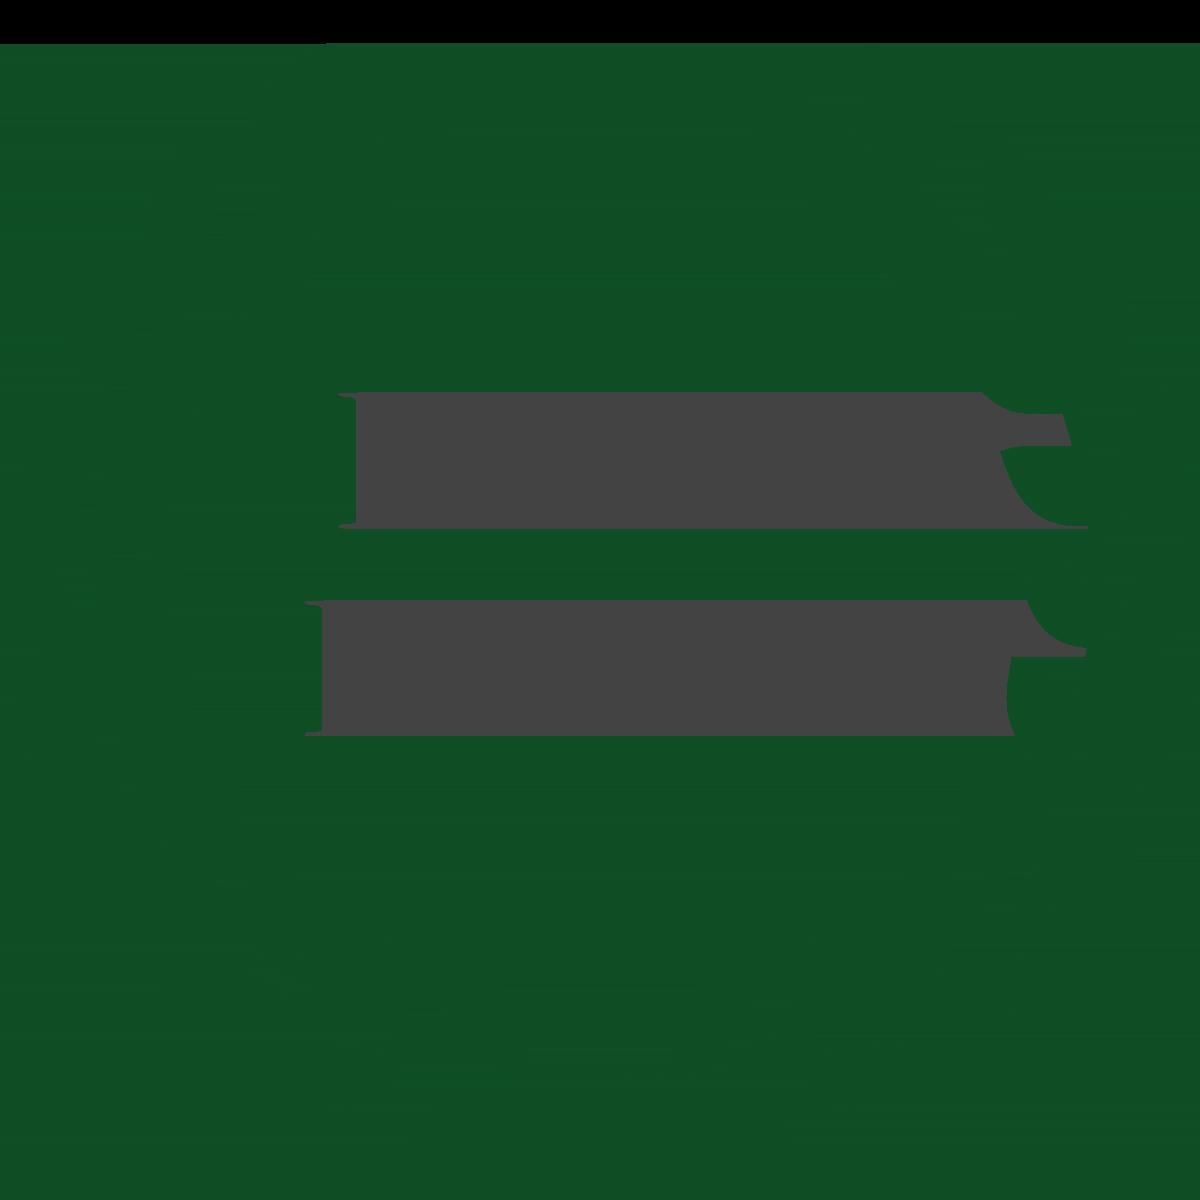 MCFM Member